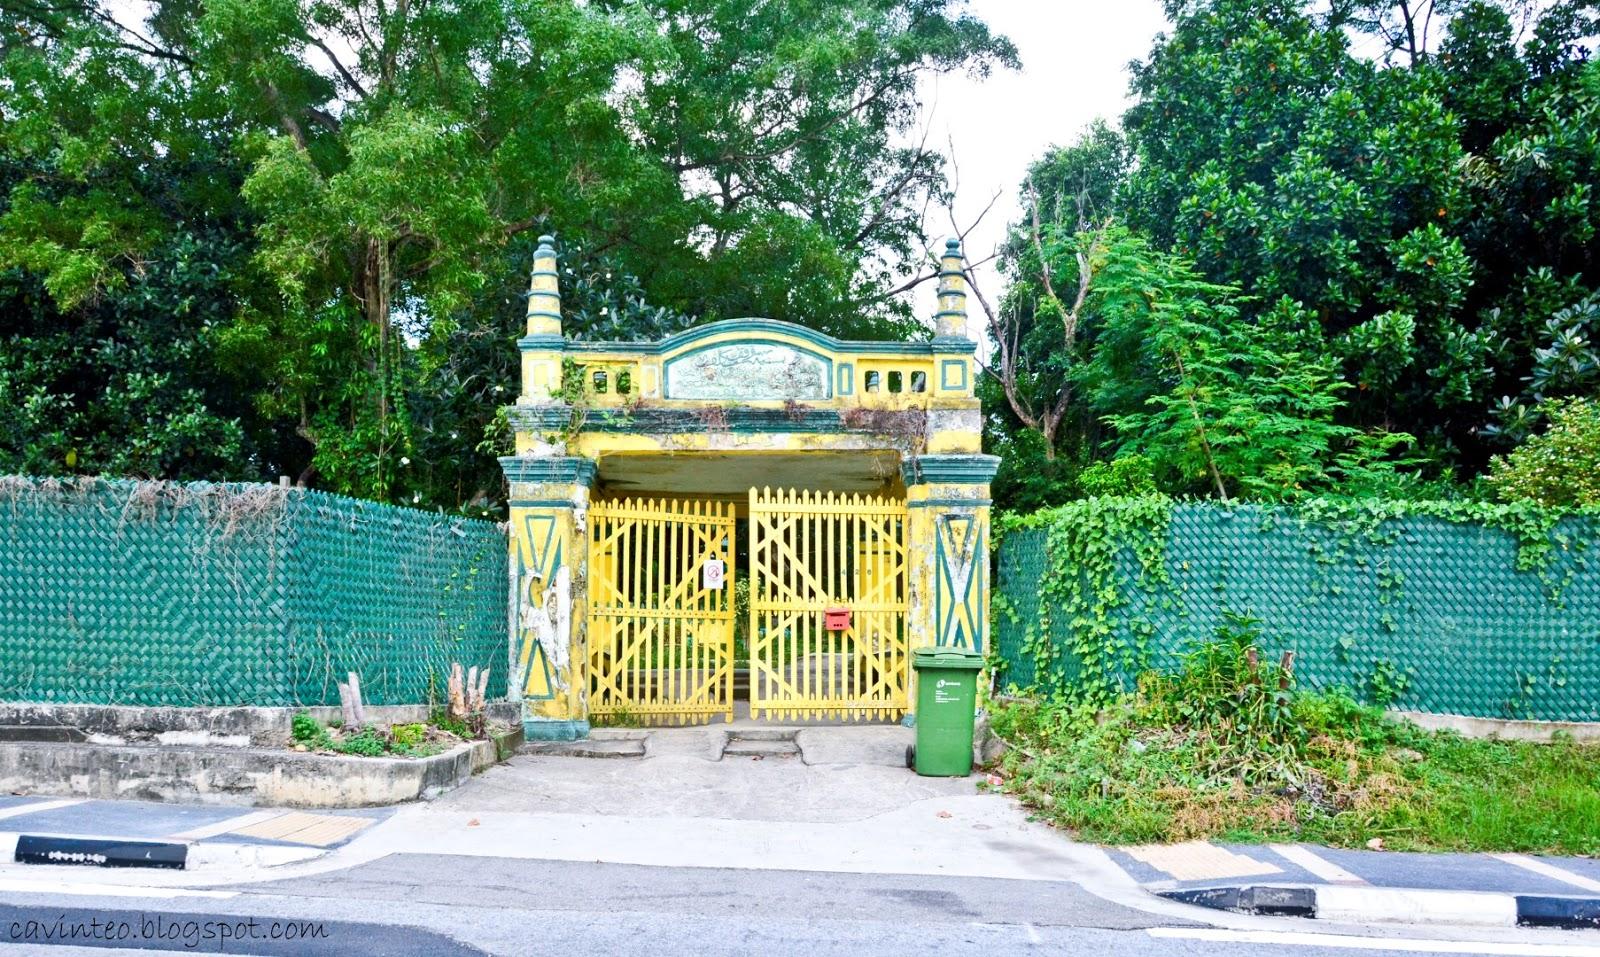 Kubur Kassim Muslim Cemetery - A Teaser